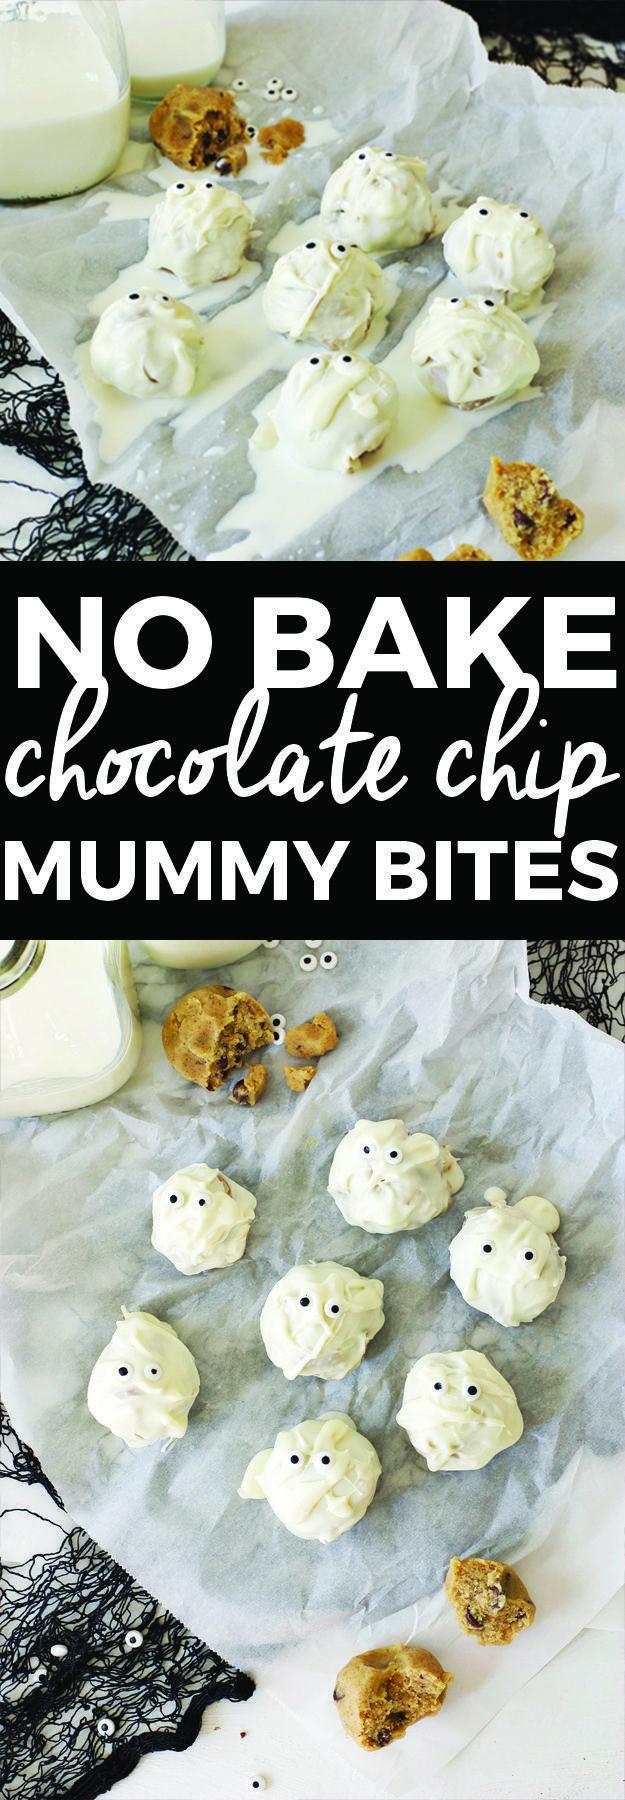 No Bake Chocolate Chip Mummy Bites Easy halloween food